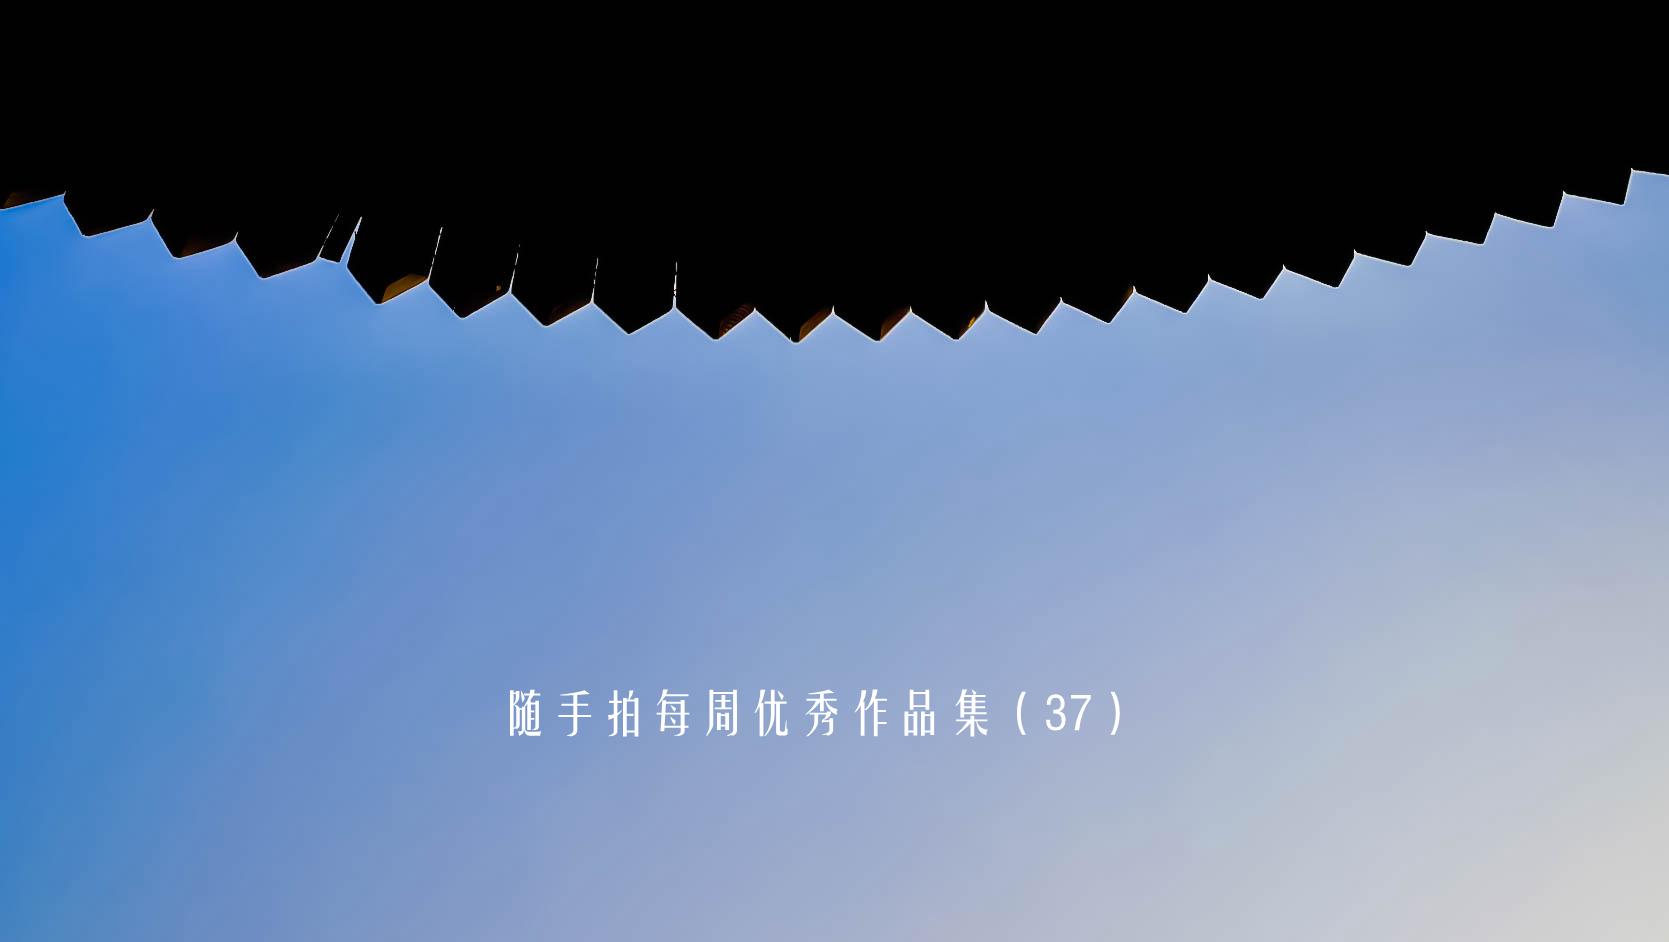 IMG_20170121_085025_副本_副本.jpg